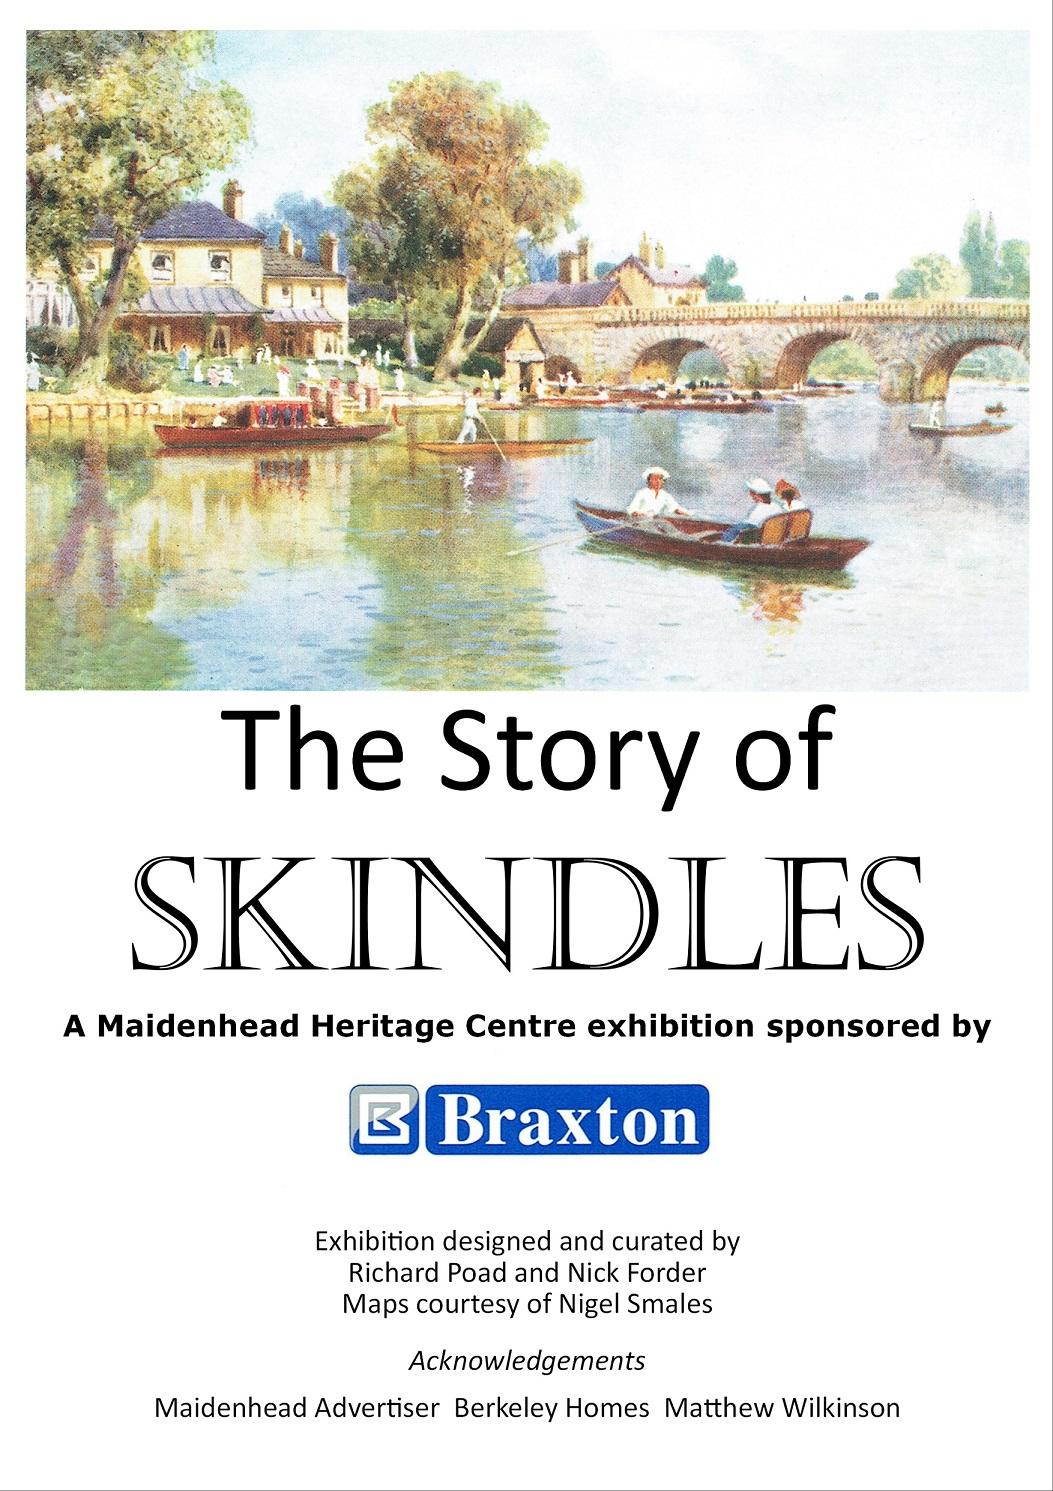 Maidenhead Heritage Centre - Skindles Exhibition